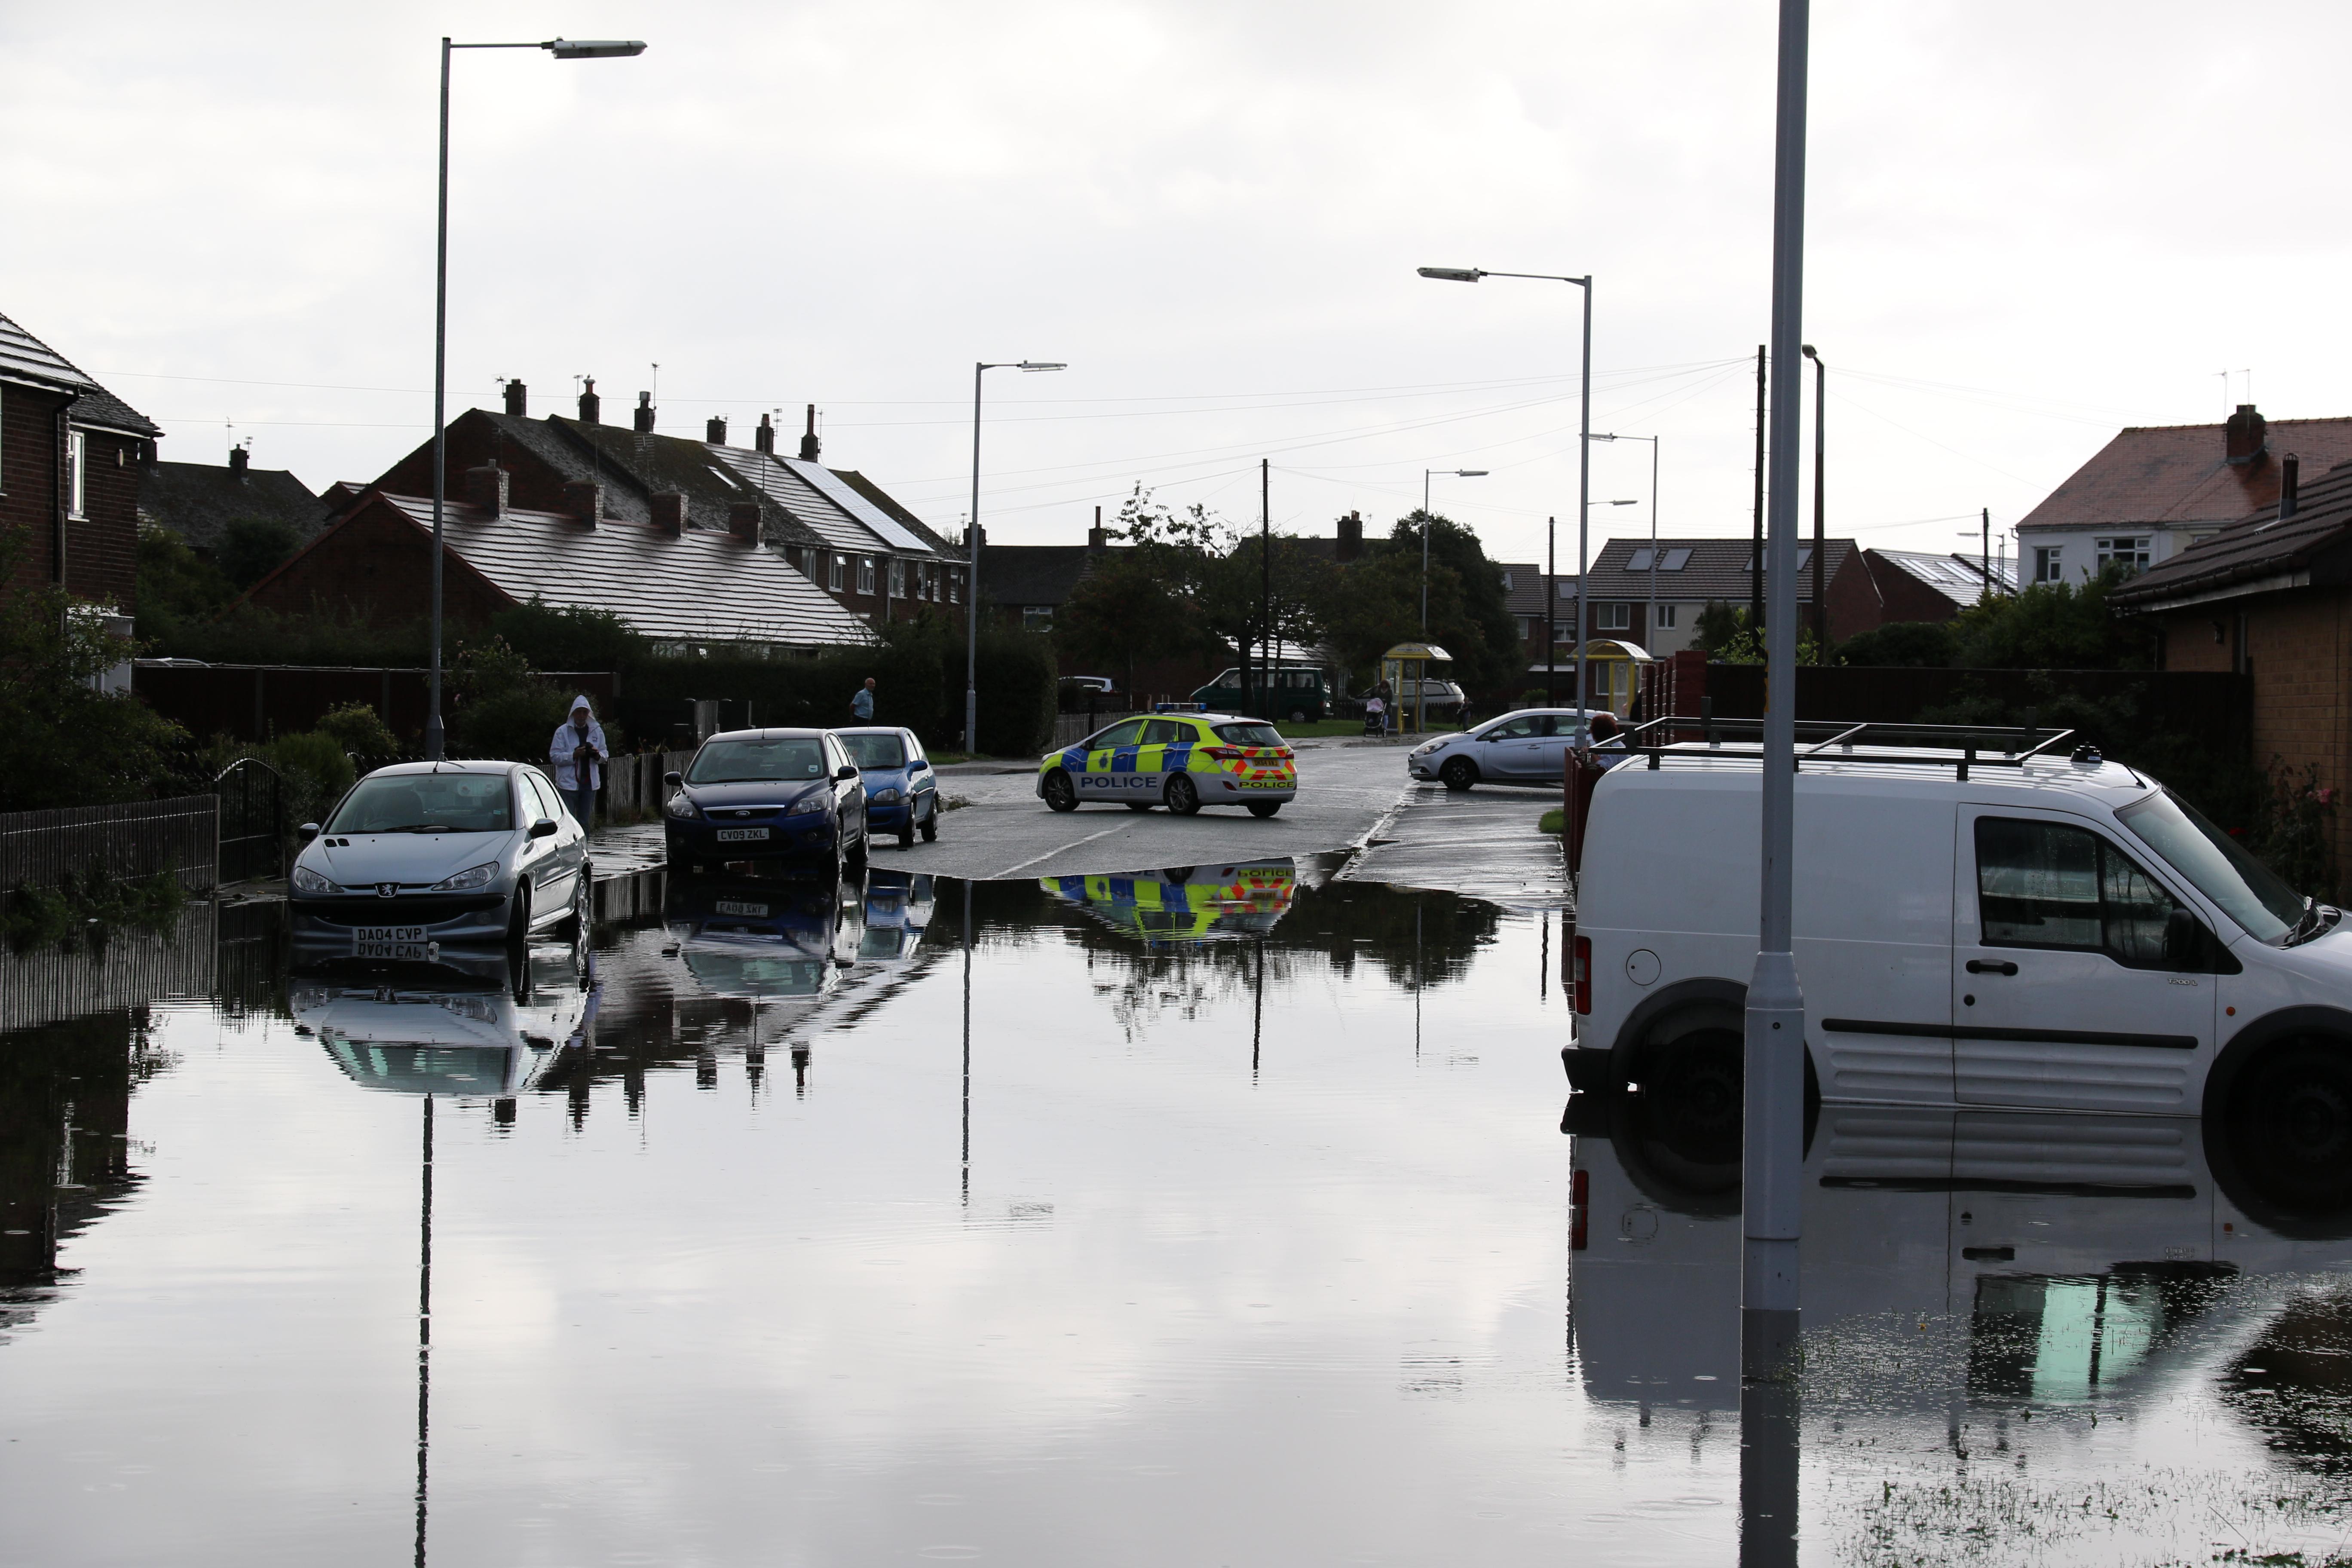 Moreton Floods - Town Meadow Lane towards Bermuda Road